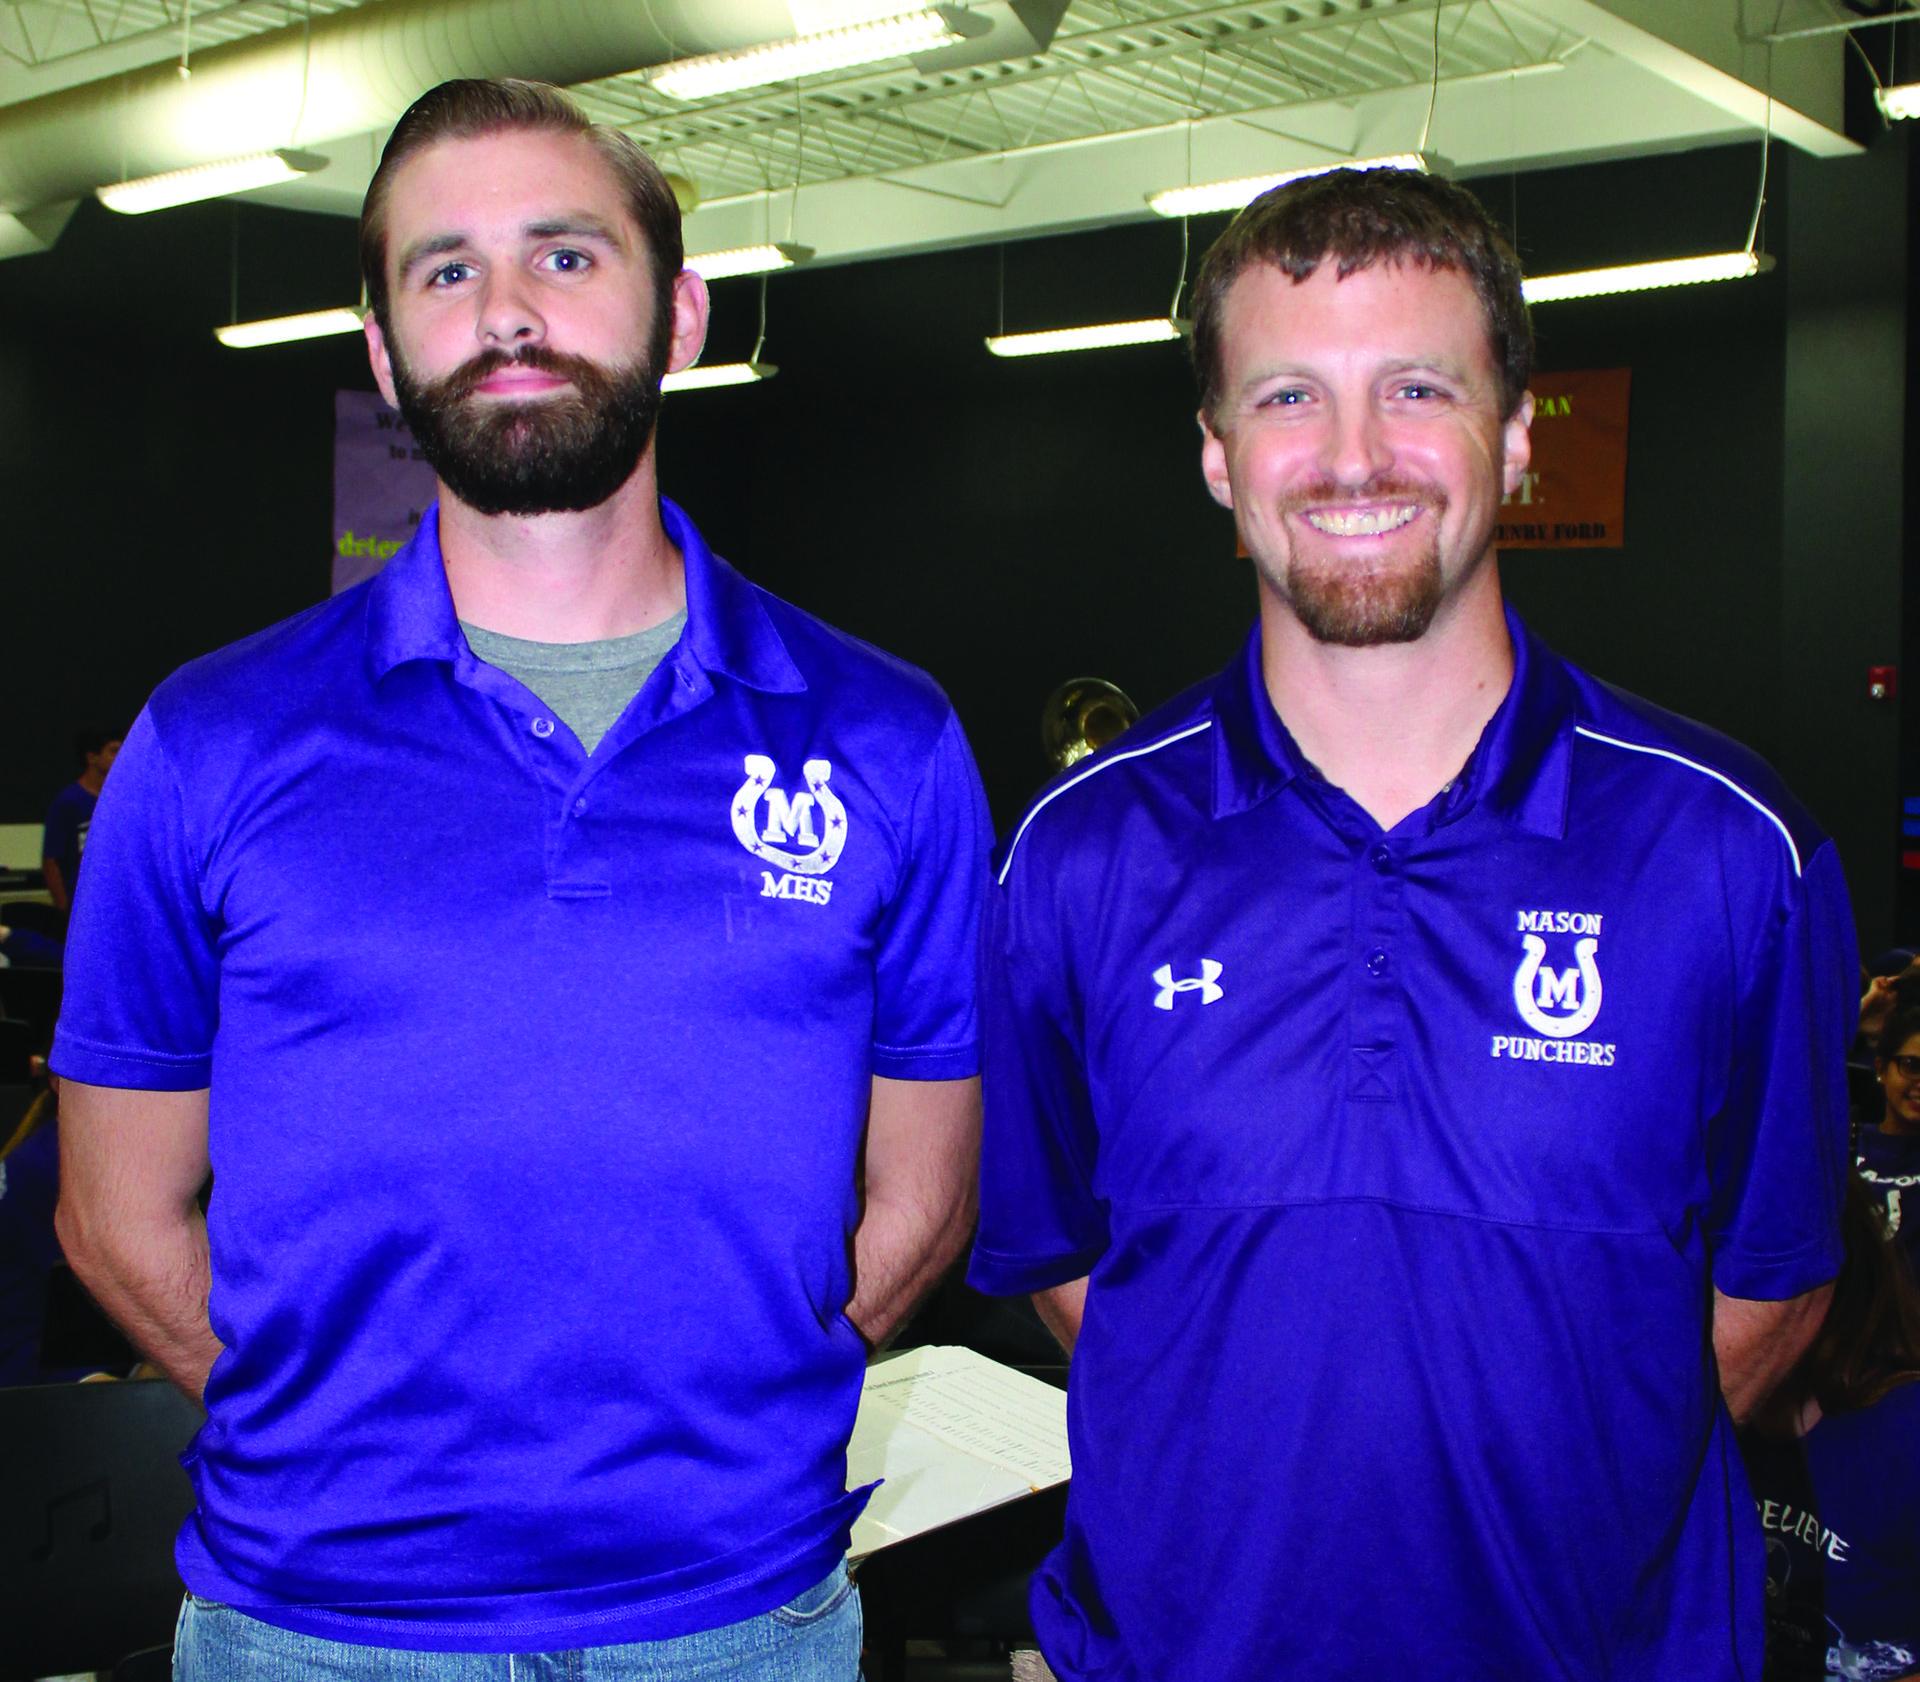 Mr. McPherson and Mr. Halamicek